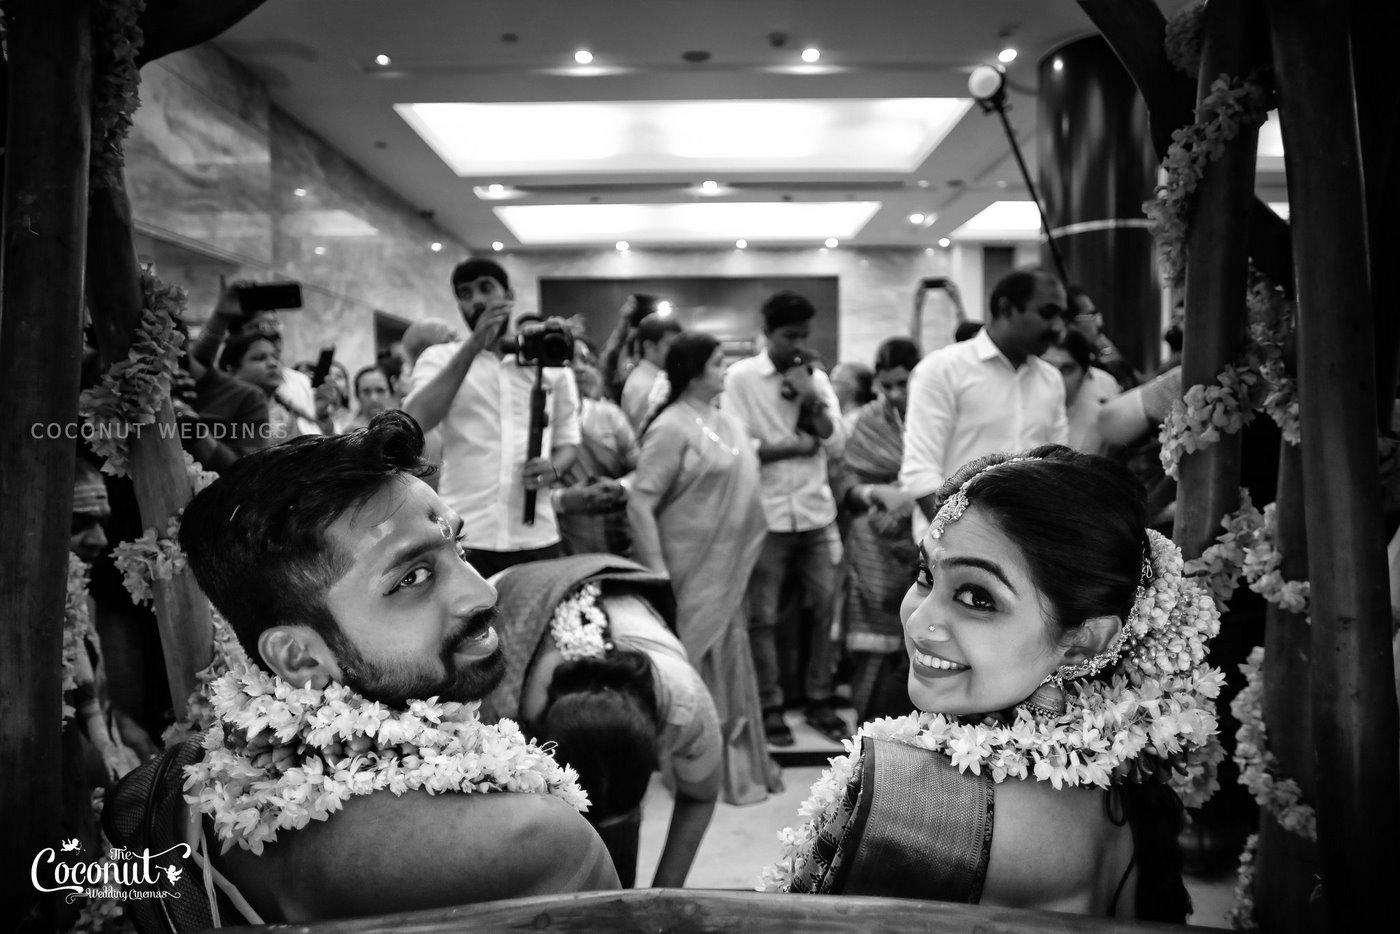 vidhya unni marriage photos 9